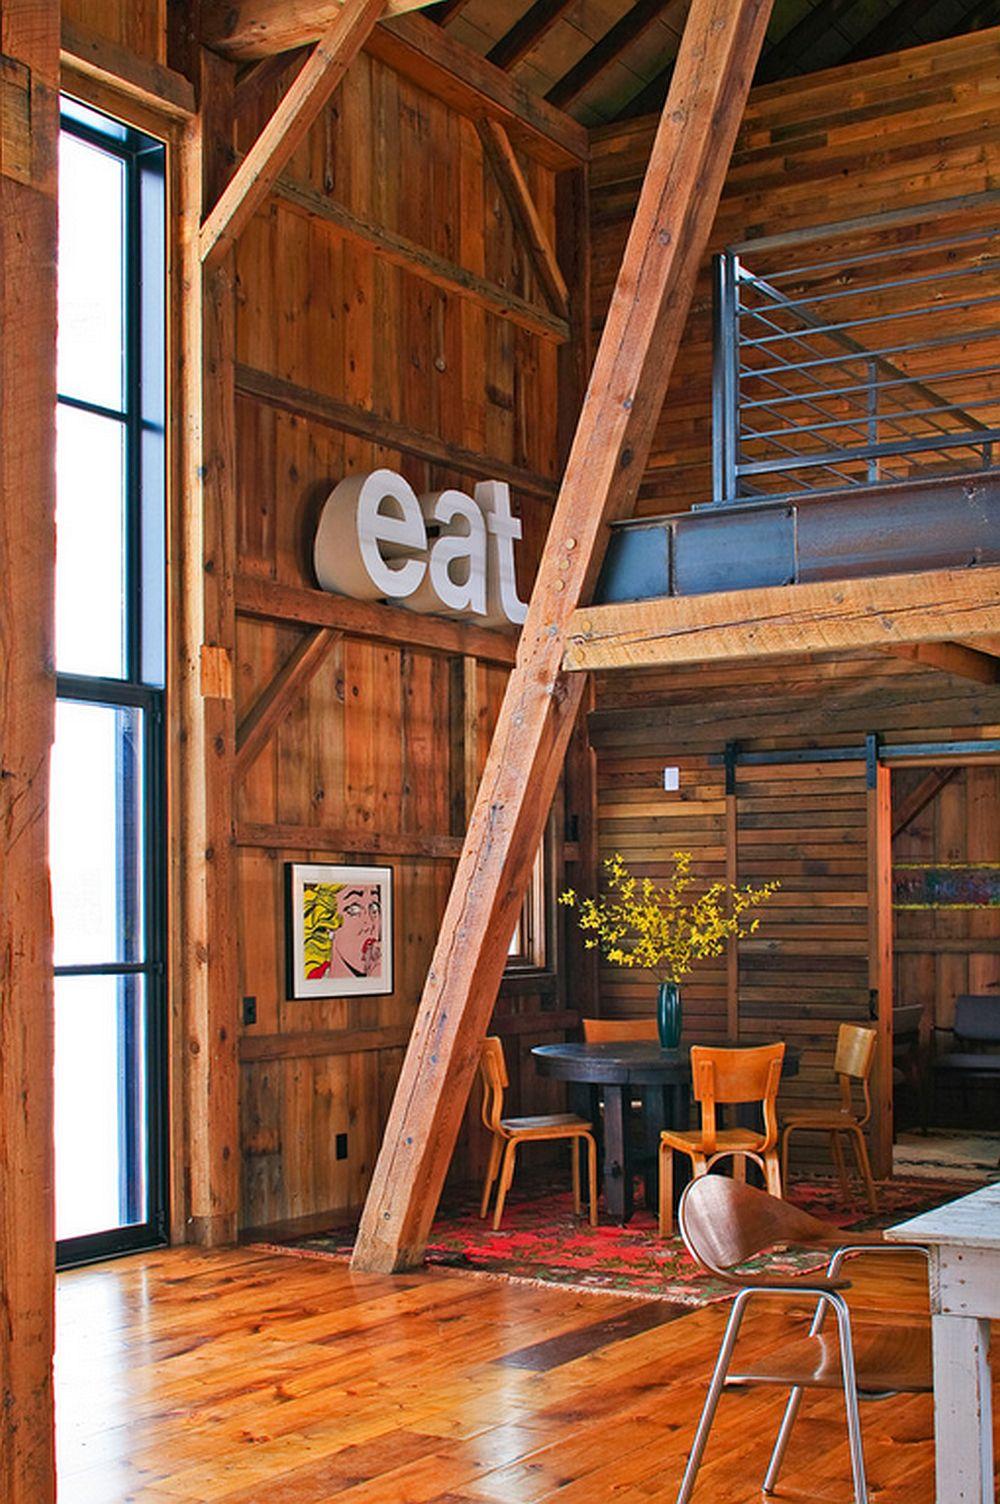 adelaparvu.com despre Michigan Barn, architect Austin DePree, Northworks Architects, interior hambar modernizat  (6)